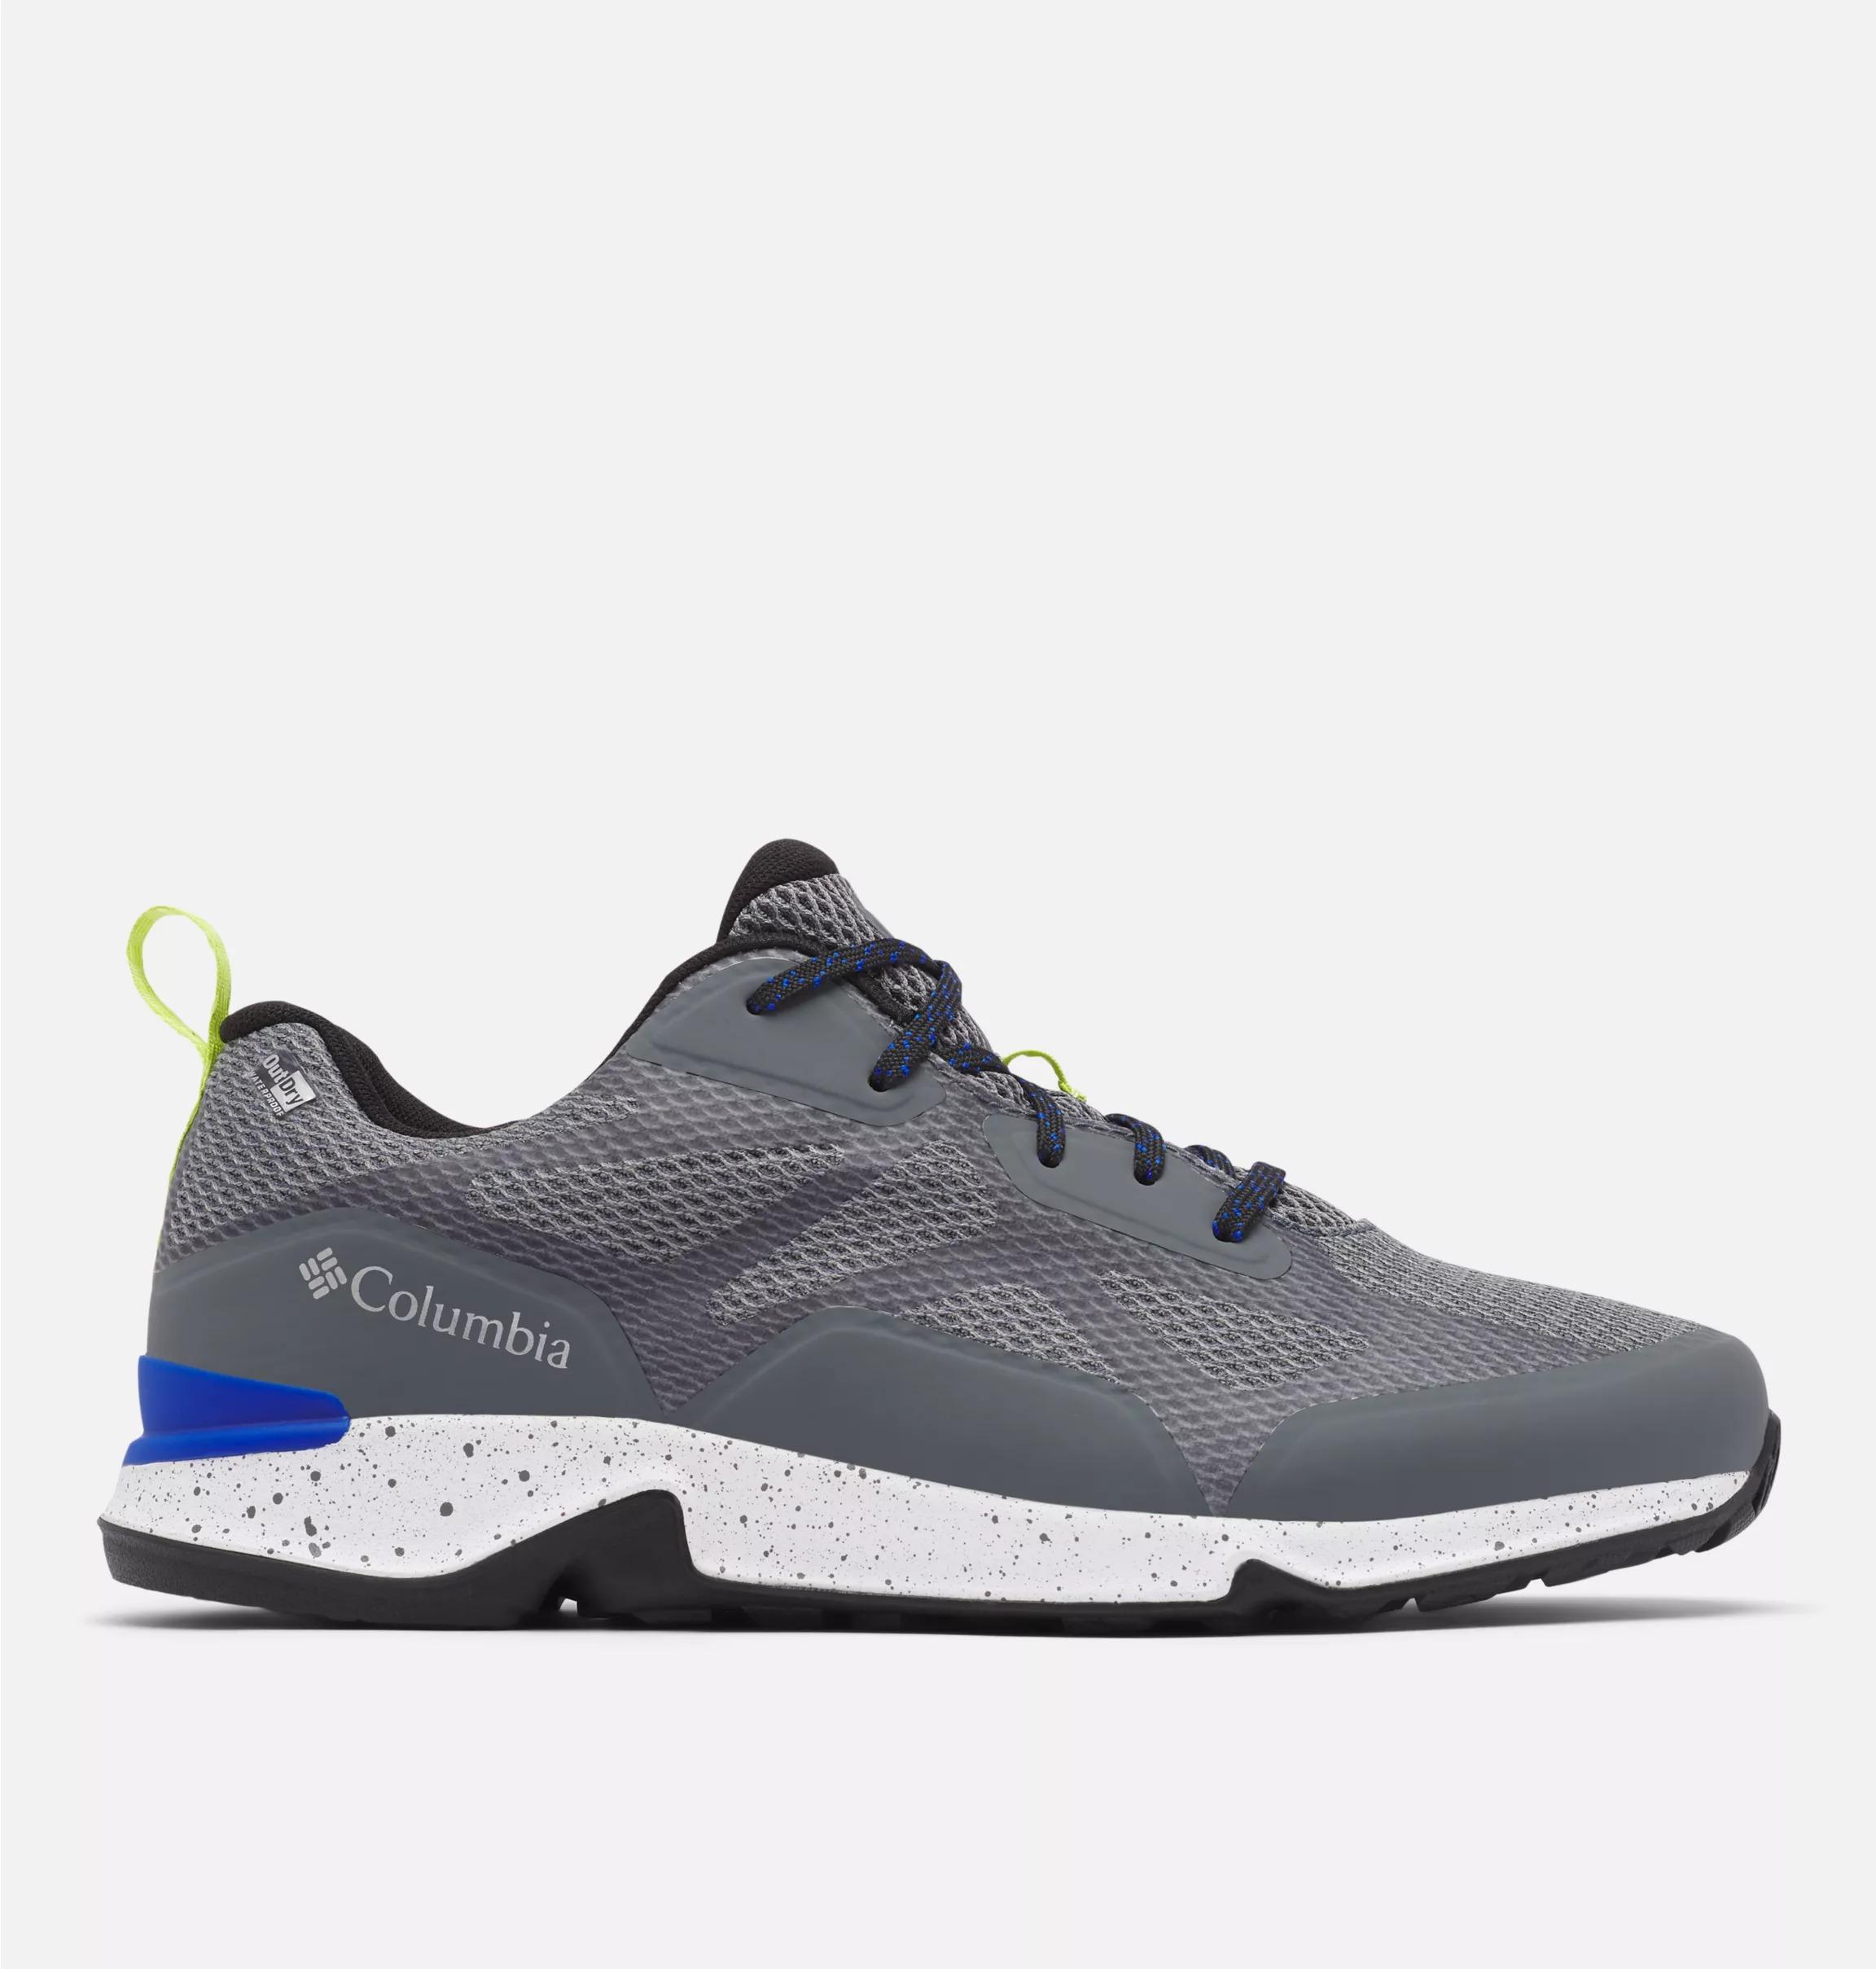 Columbia Vitesse OutDry Hiking Shoe